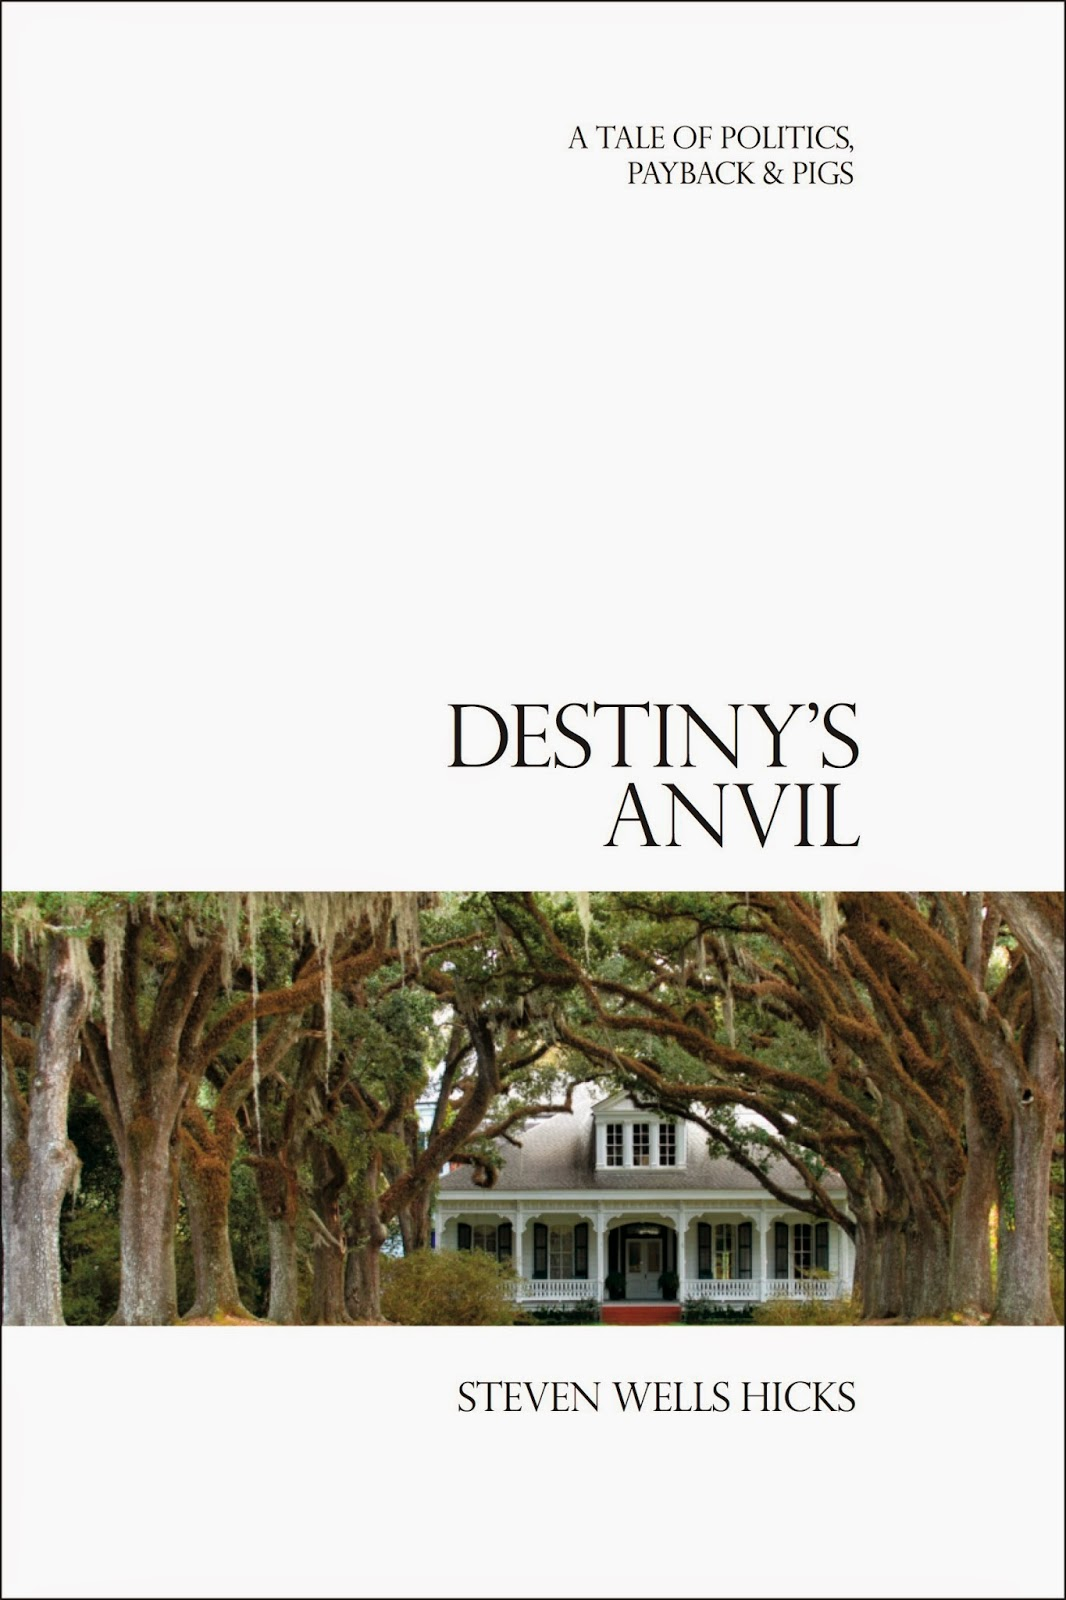 Destiny's Anvil by Steven Hicks